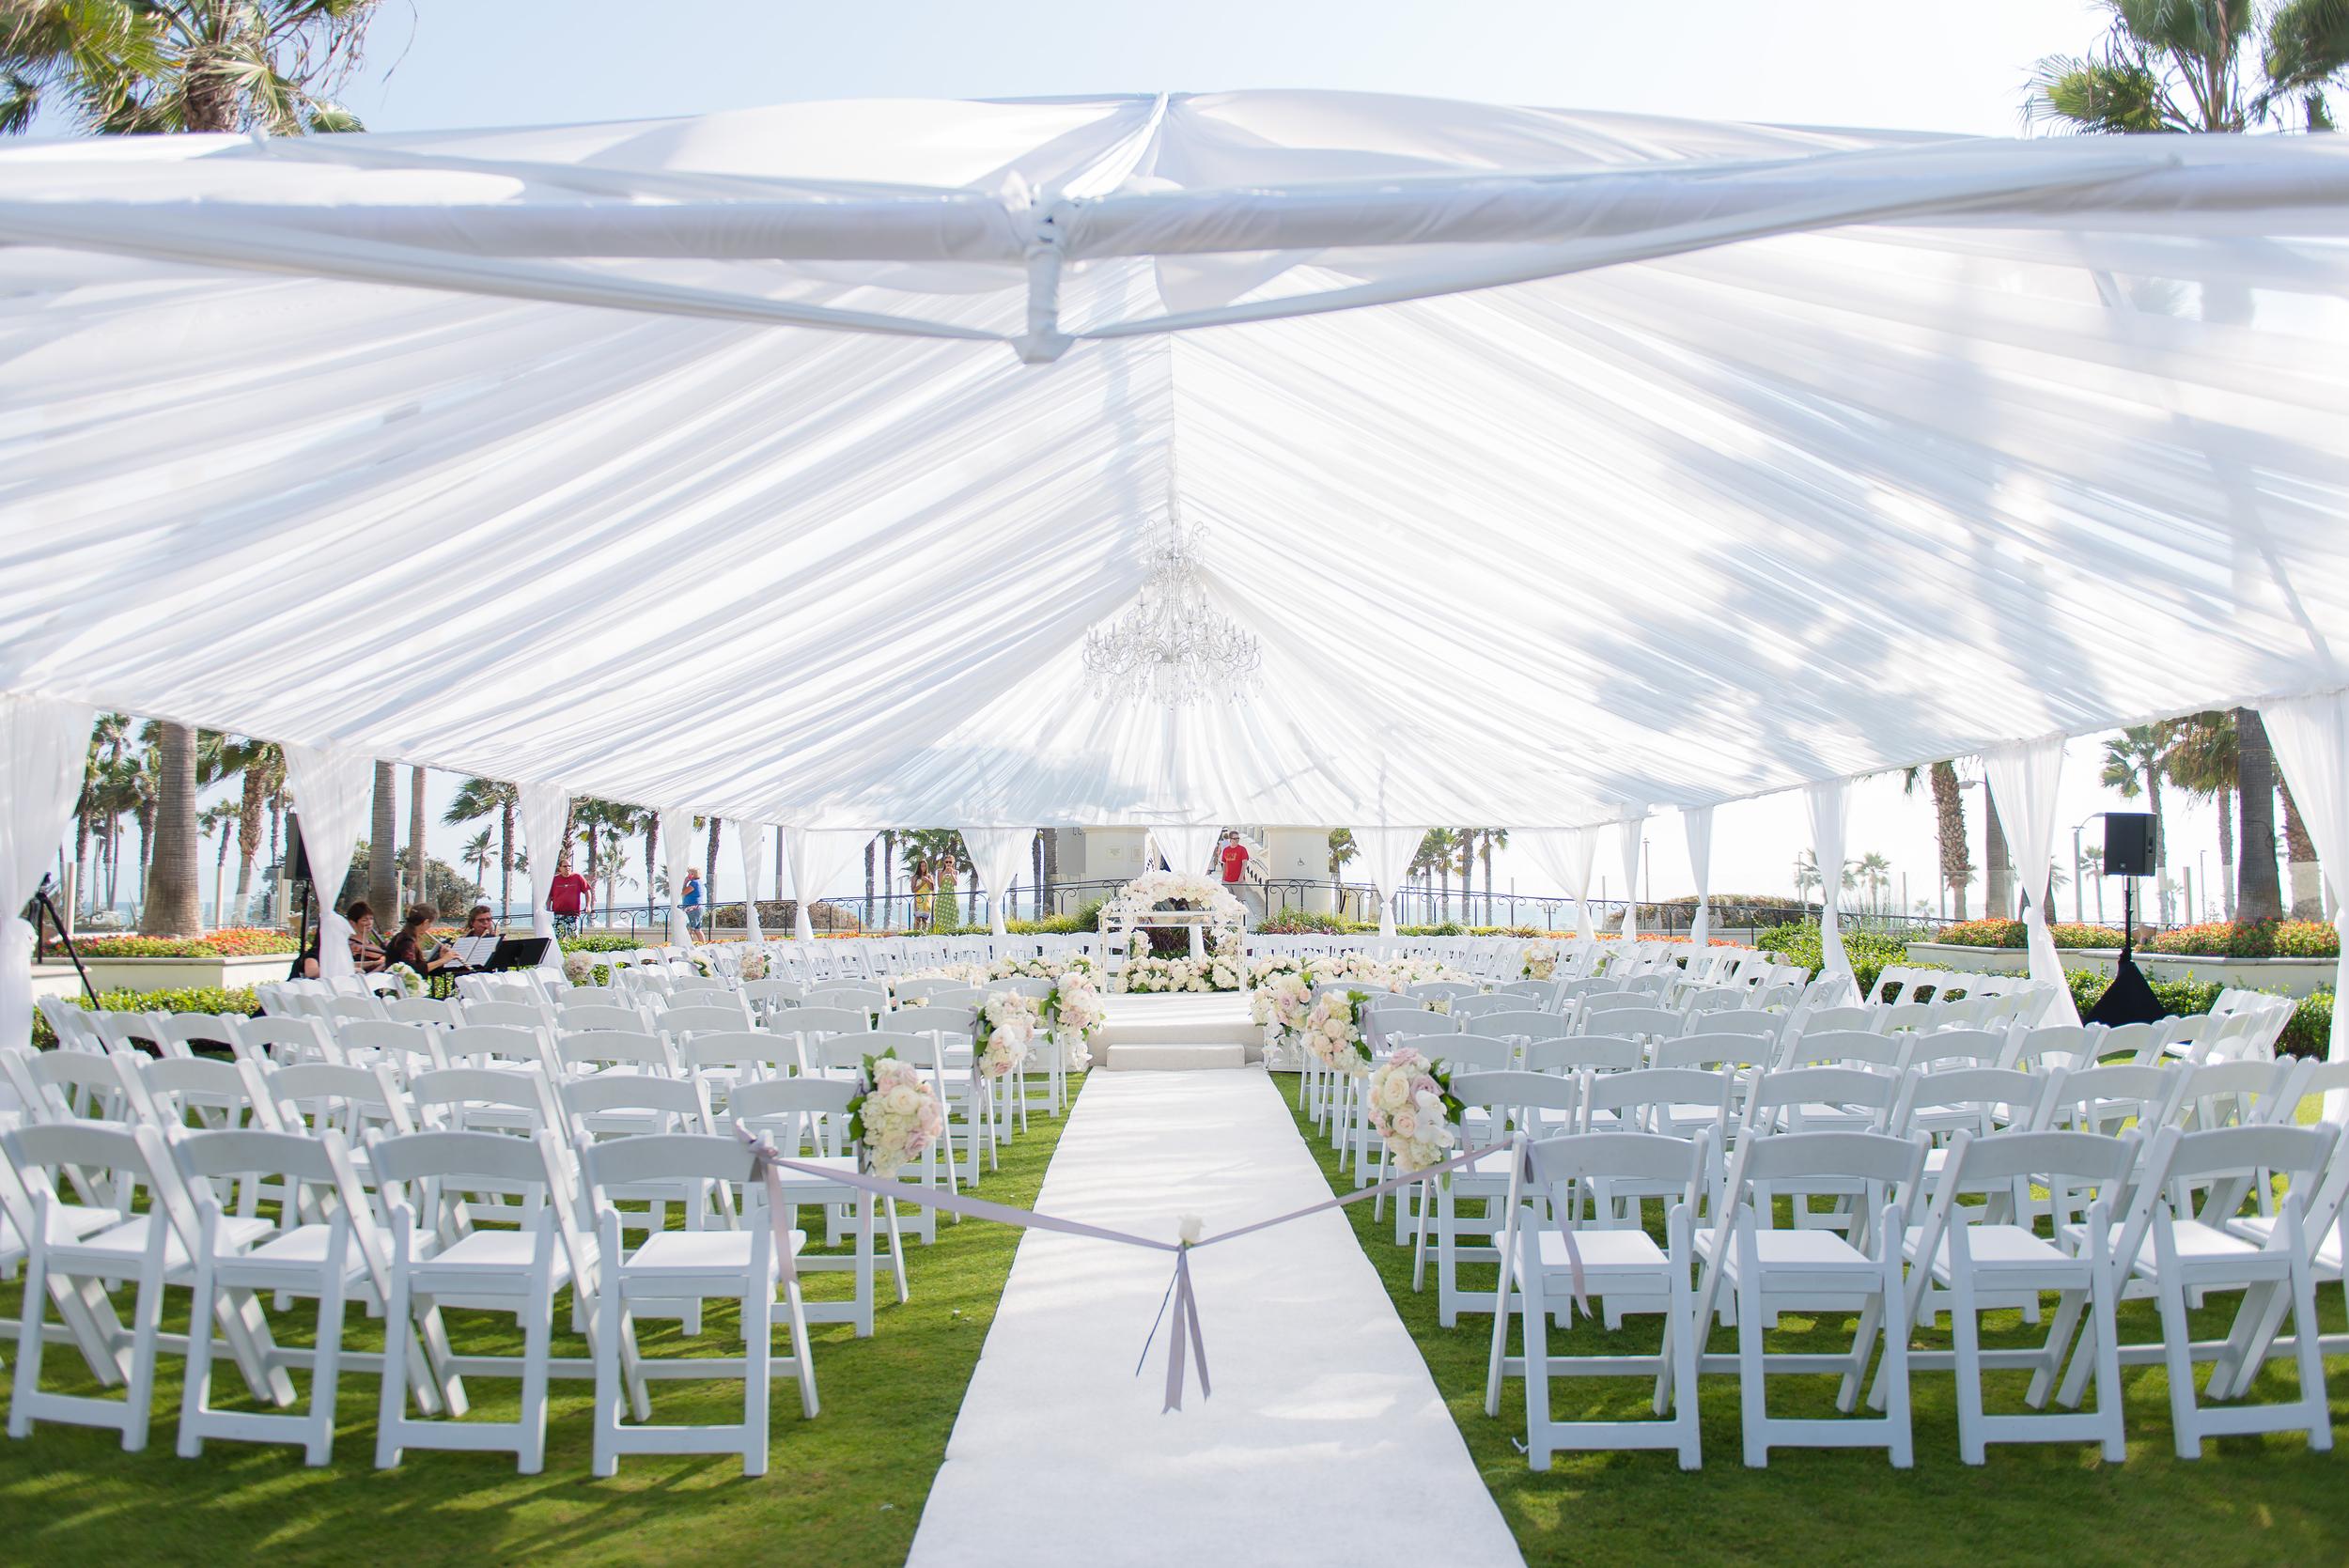 ORANGE-COUNTY-WEDDING-PHOTOGRAPHER-THE-YODSUKARS-0840.jpg